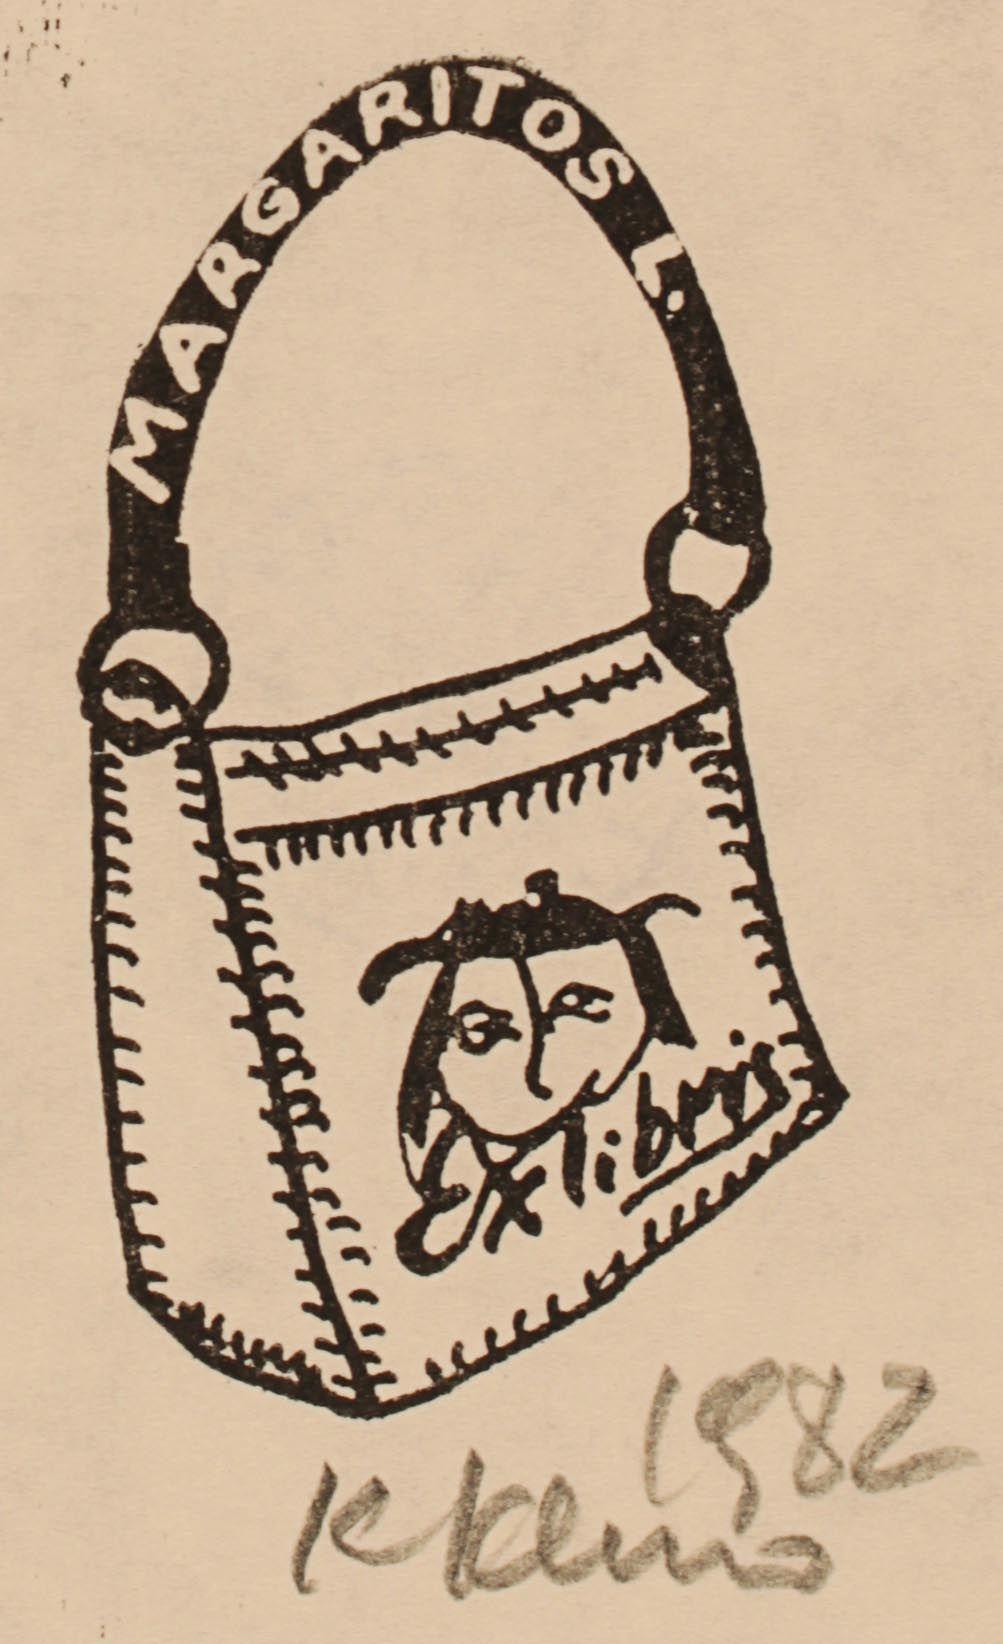 Klemensas Kupriunas, Art-exlibris.net